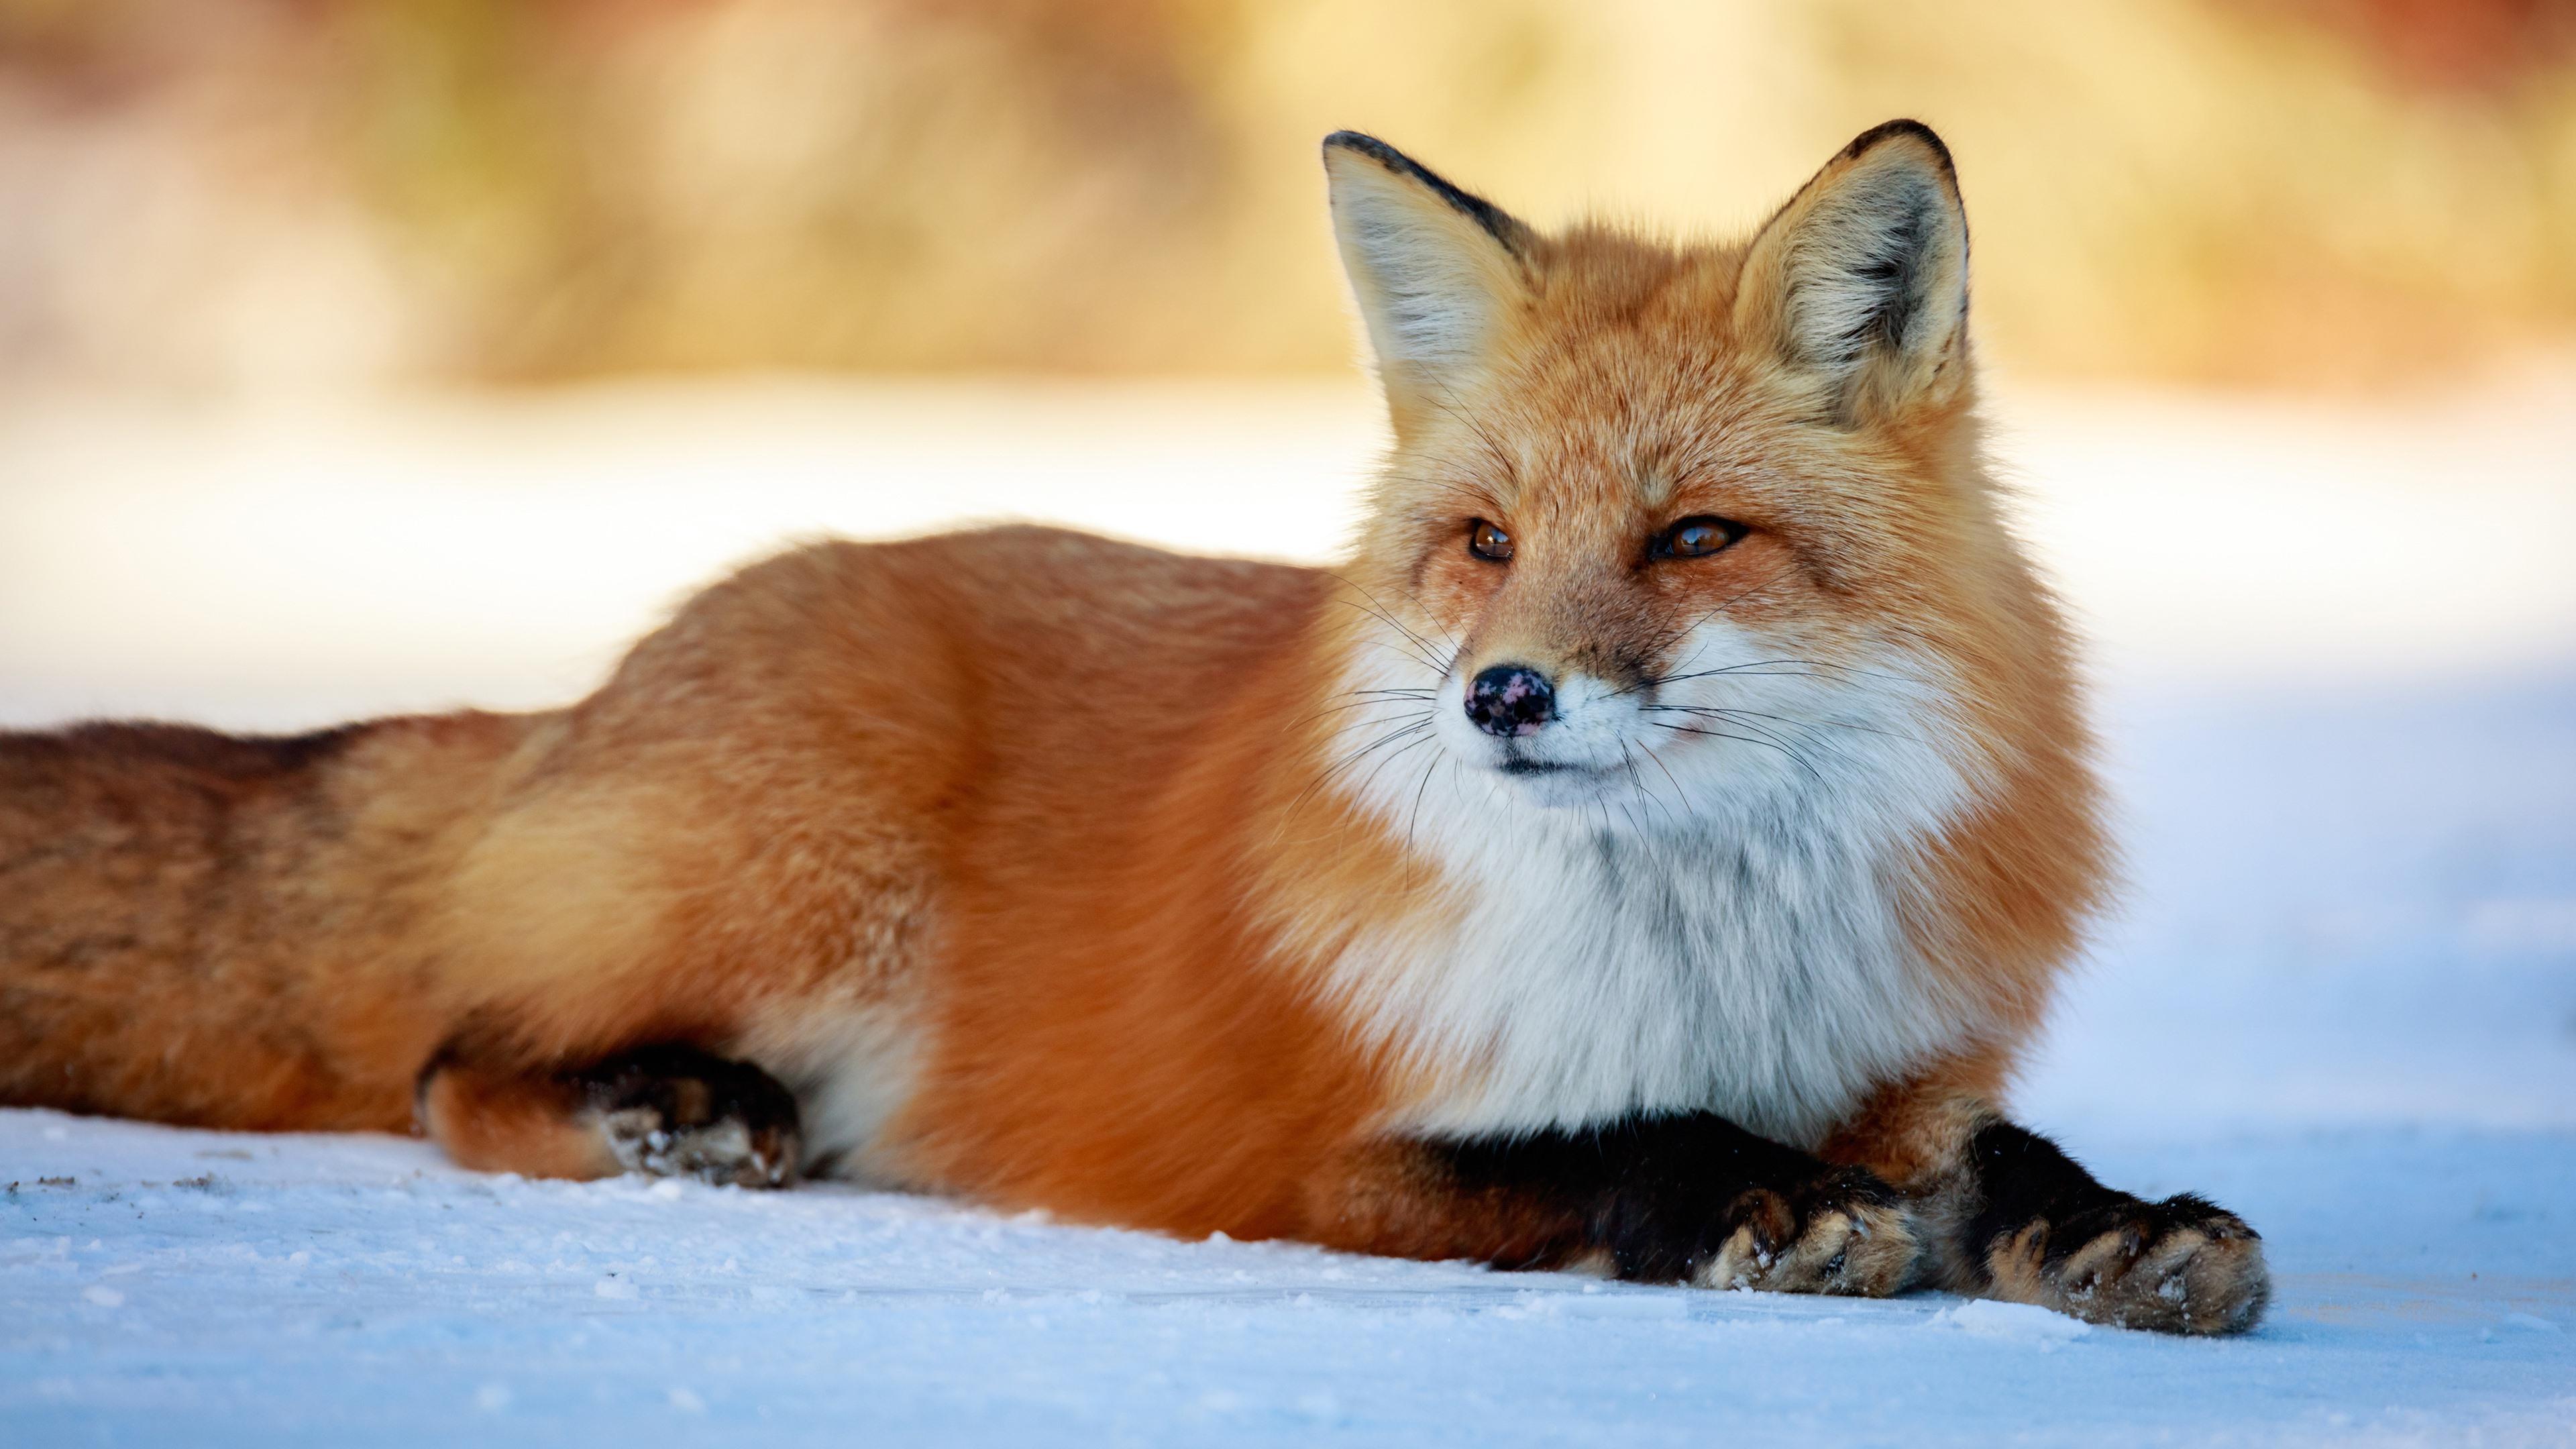 Wallpaper Cute Fox Rest Snow 3840x2160 Uhd 4k Picture Image